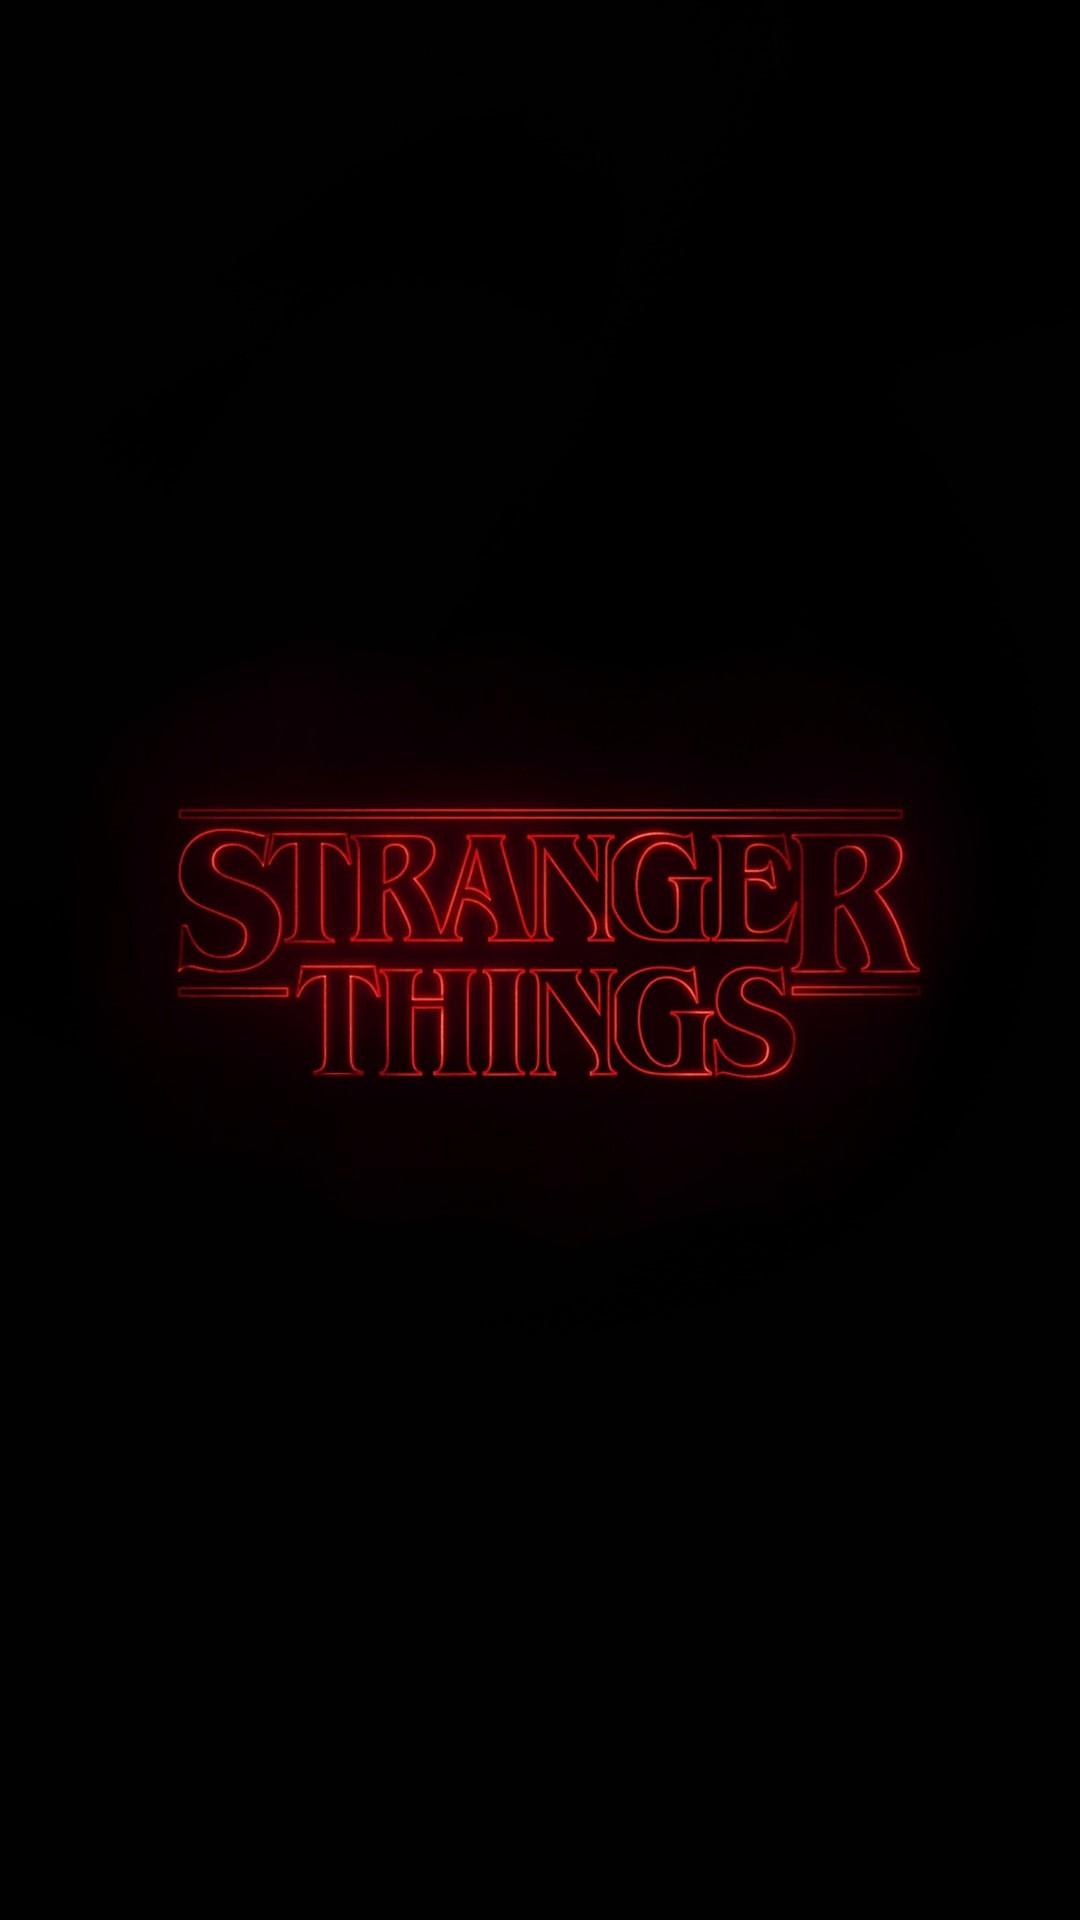 Stranger Things lock screen wallpaper